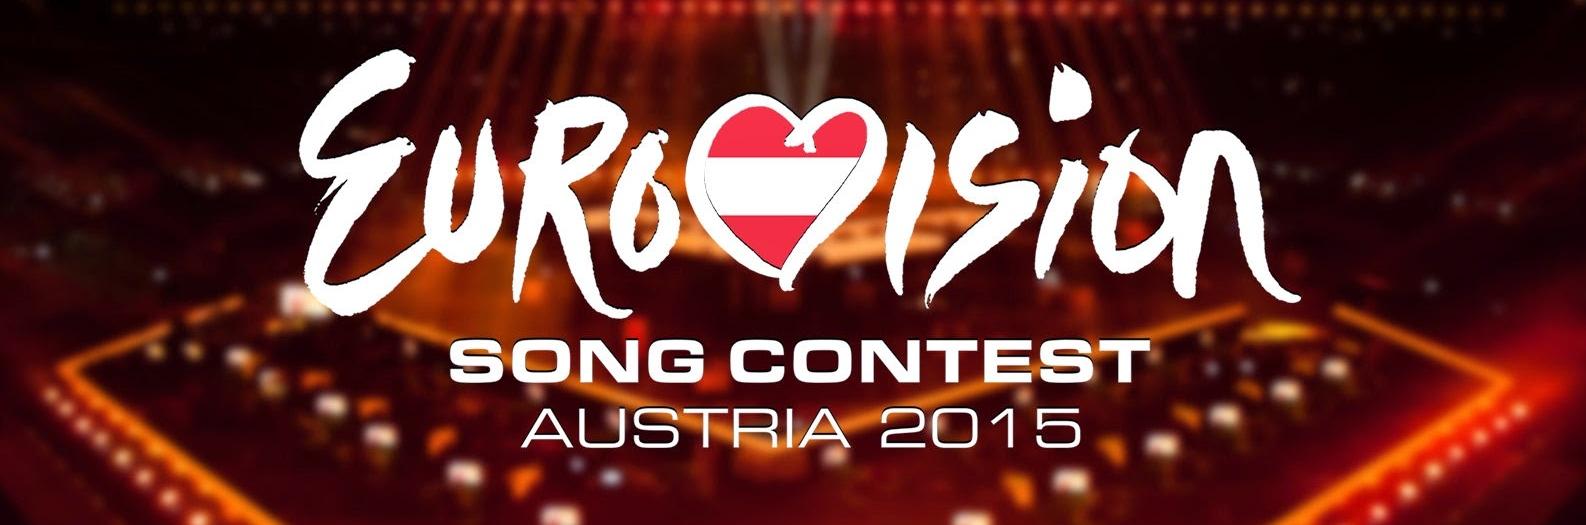 Eurovision Song Contest 2015 Österreich Austria Innsbruck Olympia World